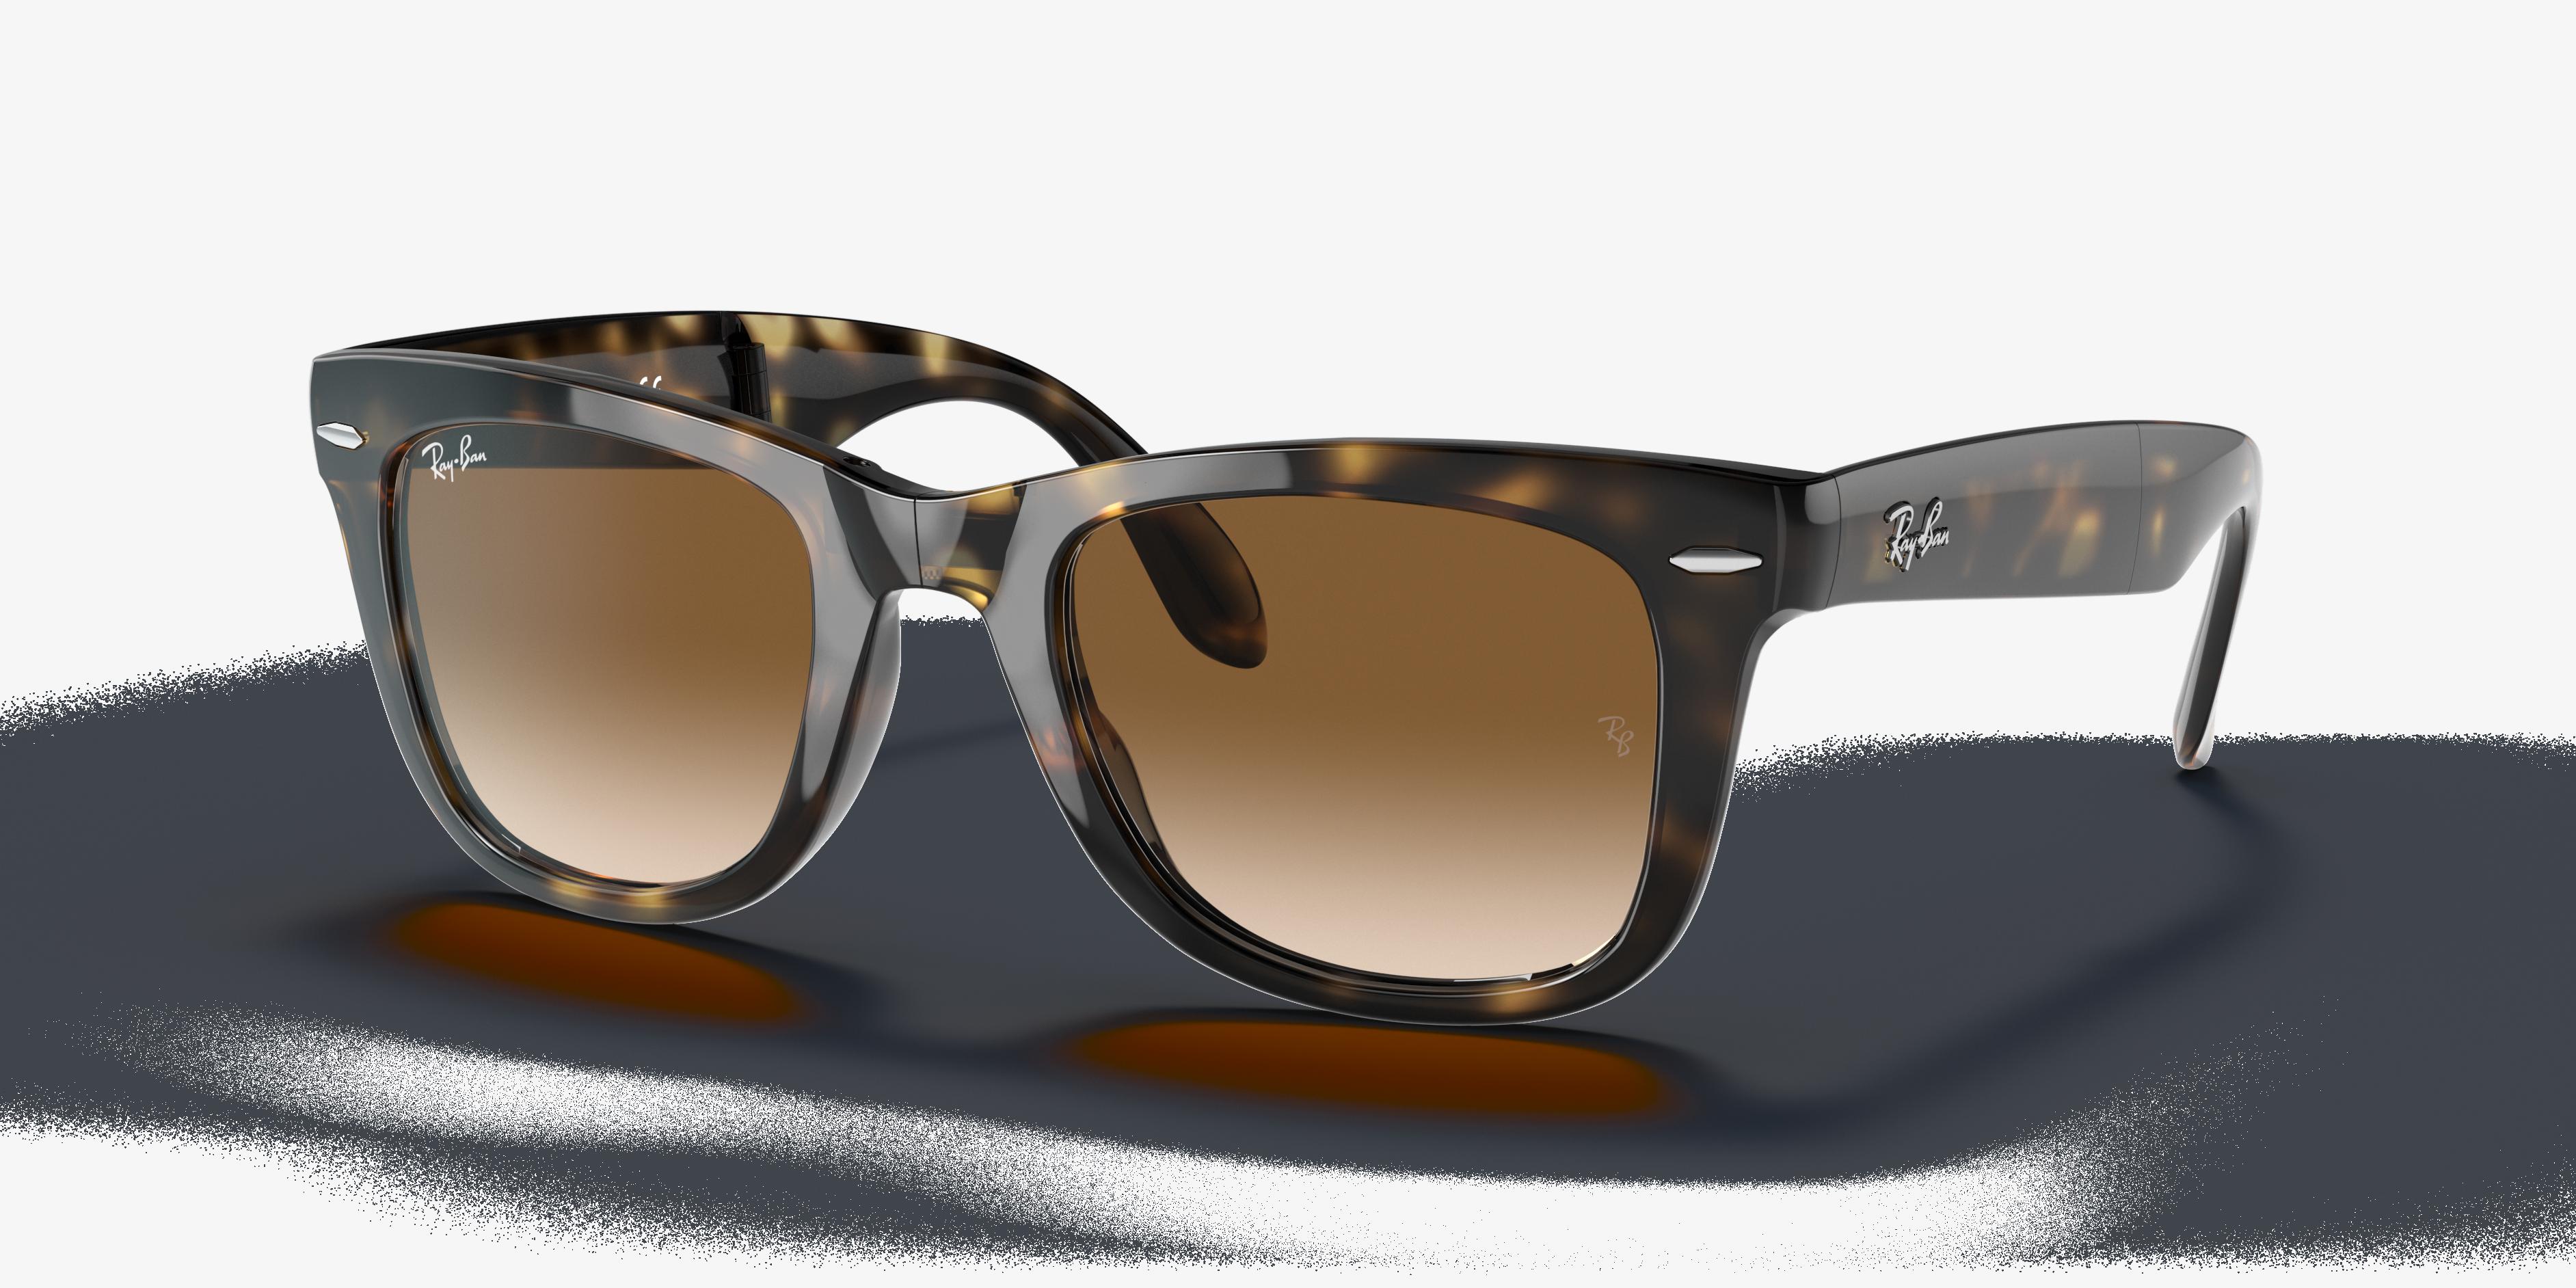 Ray-Ban Wayfarer Folding Classic Tortoise, Brown Lenses - RB4105